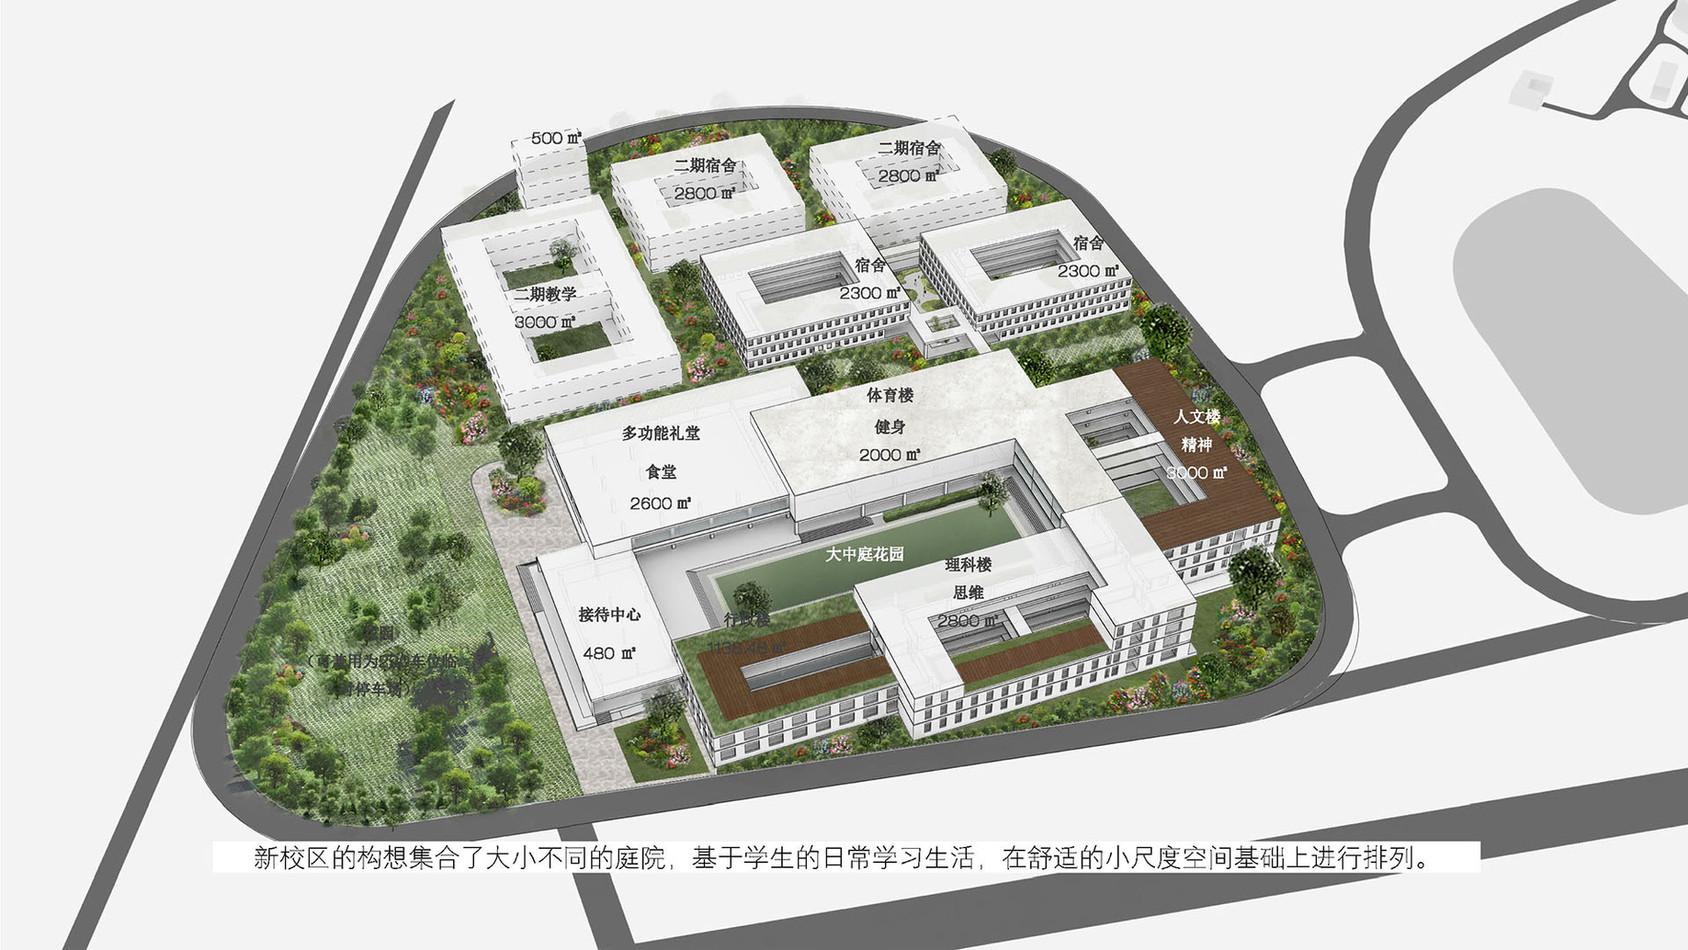 TAIHU-INTERNATIONAL-SCHOOL-CAMPUS-ZH 04.